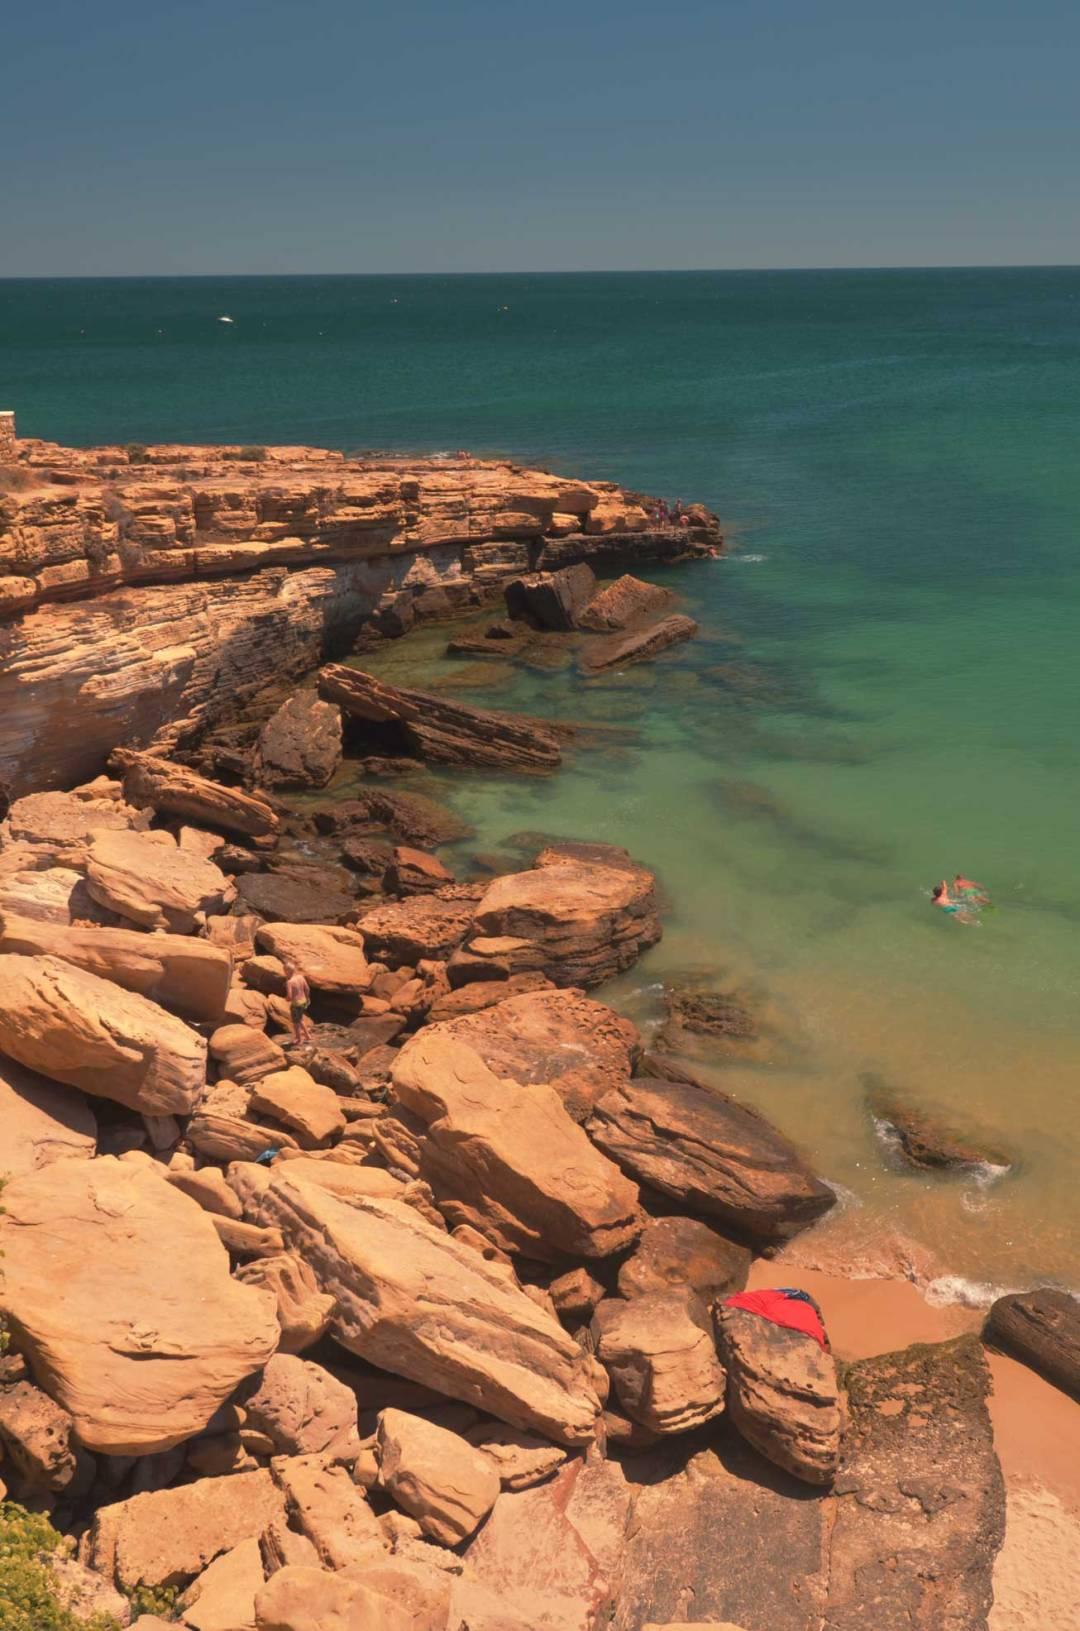 lagos portugal rocky beach